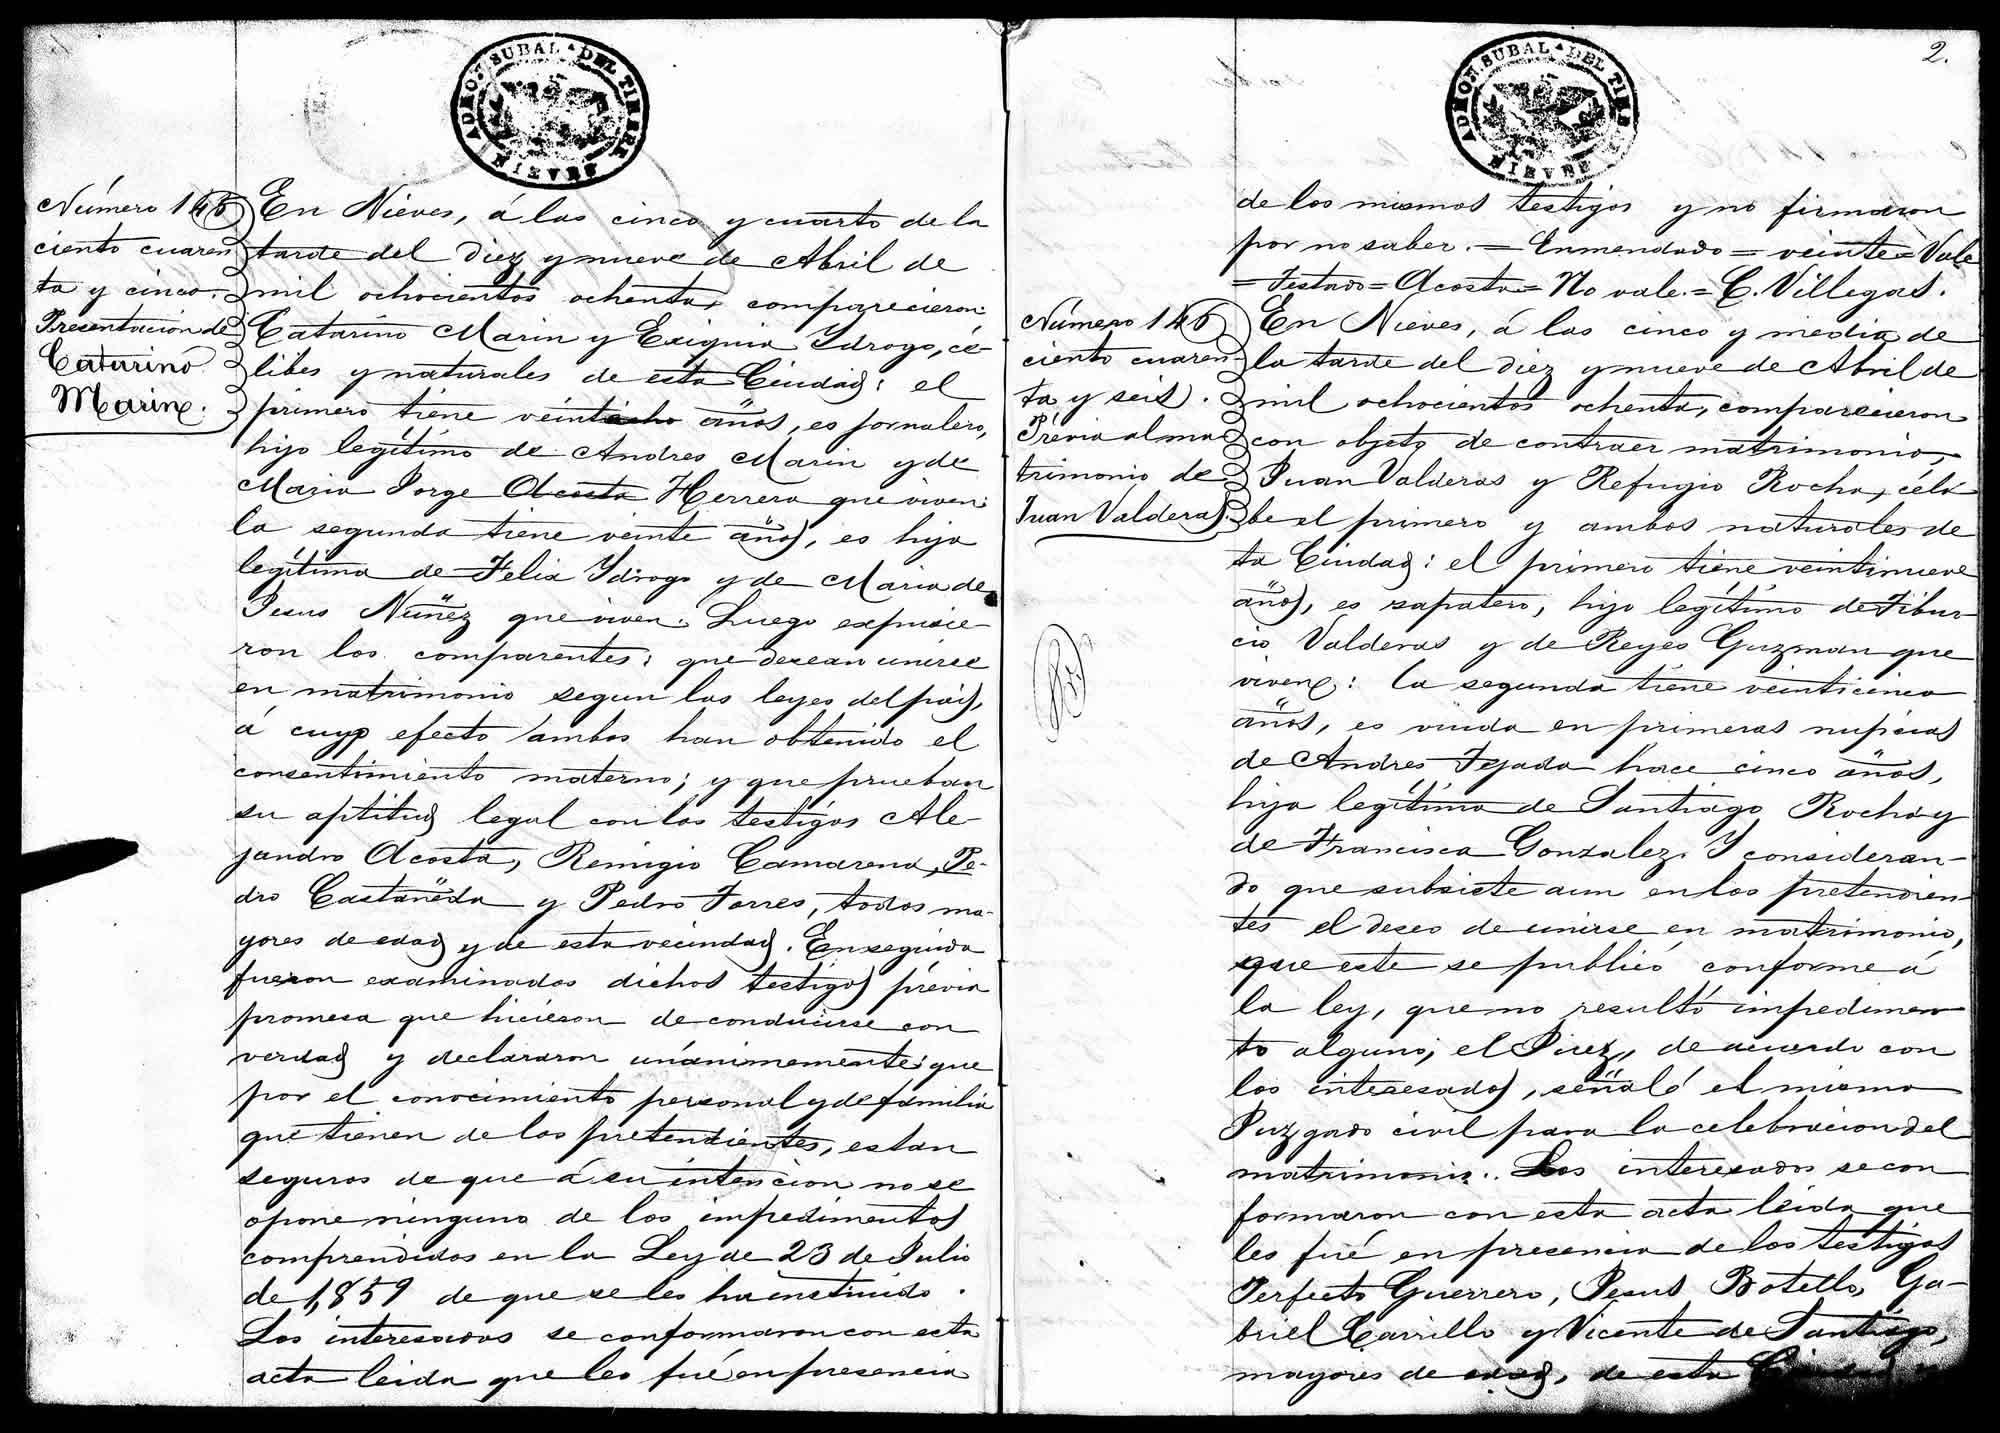 Nieves marriage record for Juan Balderas and Refugio Rocha, #146